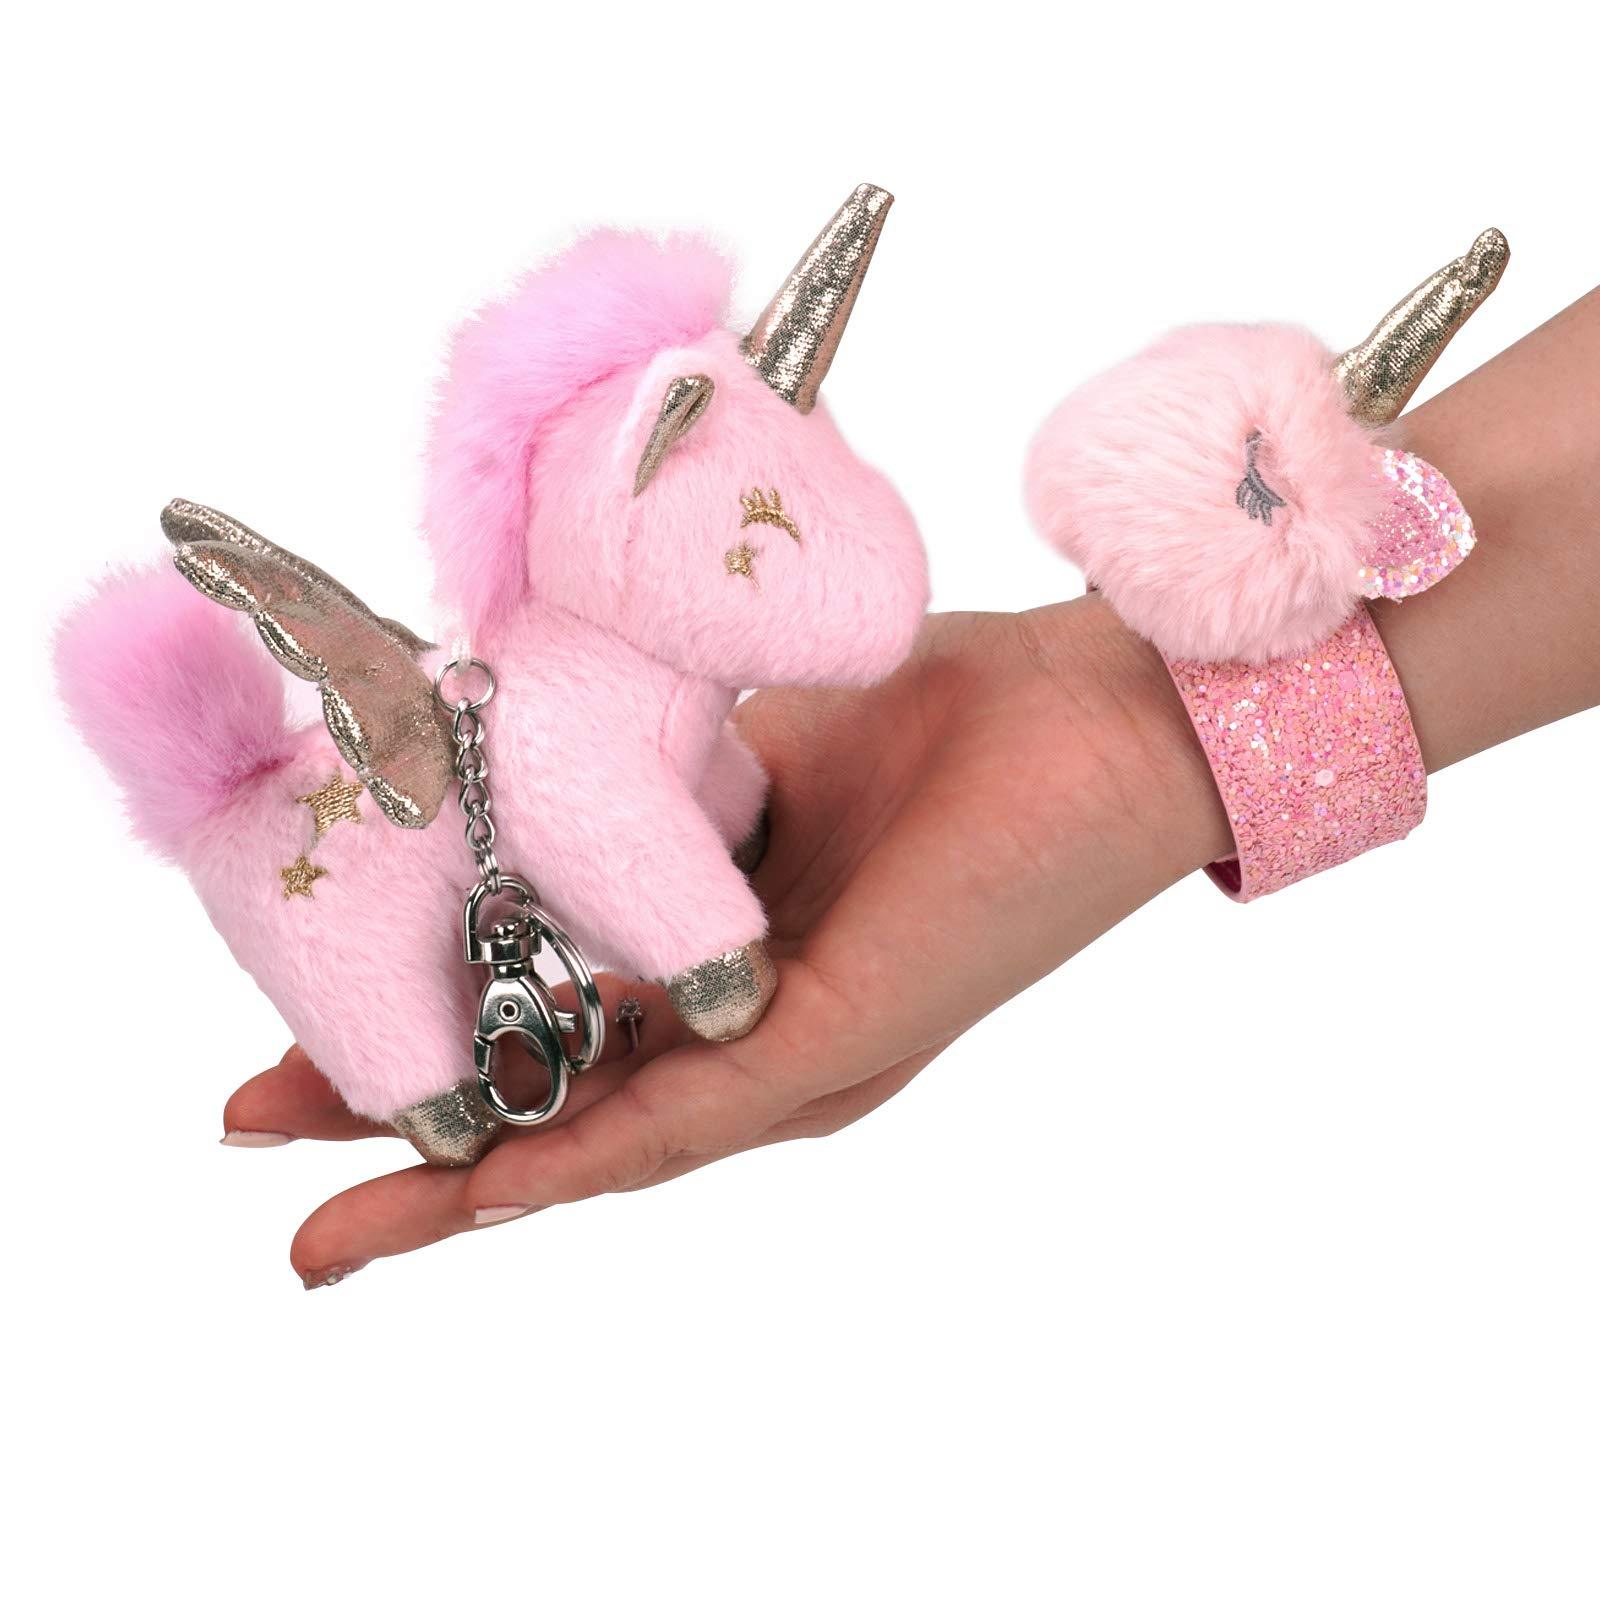 EASYLEISURE Plush Stuffed Cute Unicorn Keychain Slap Bracelet wristband as Unicorn Gifts